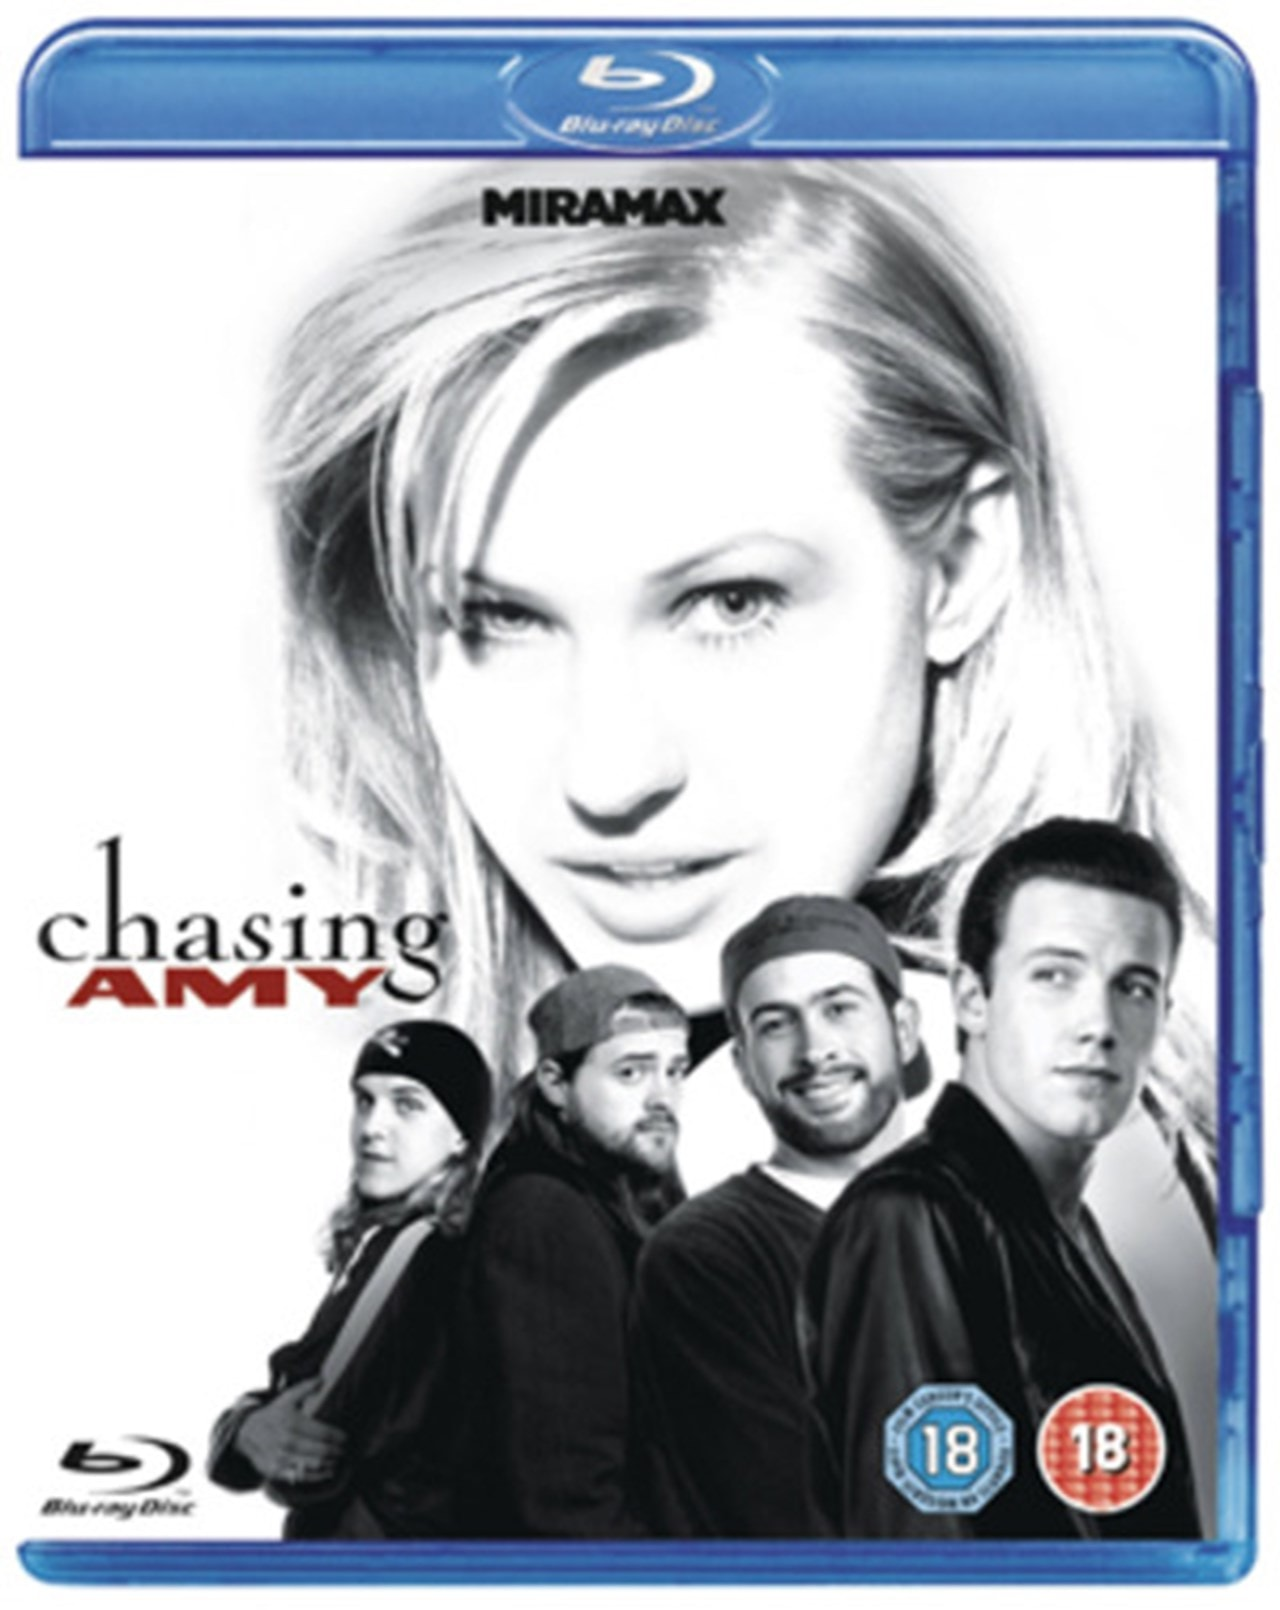 Chasing Amy - 1